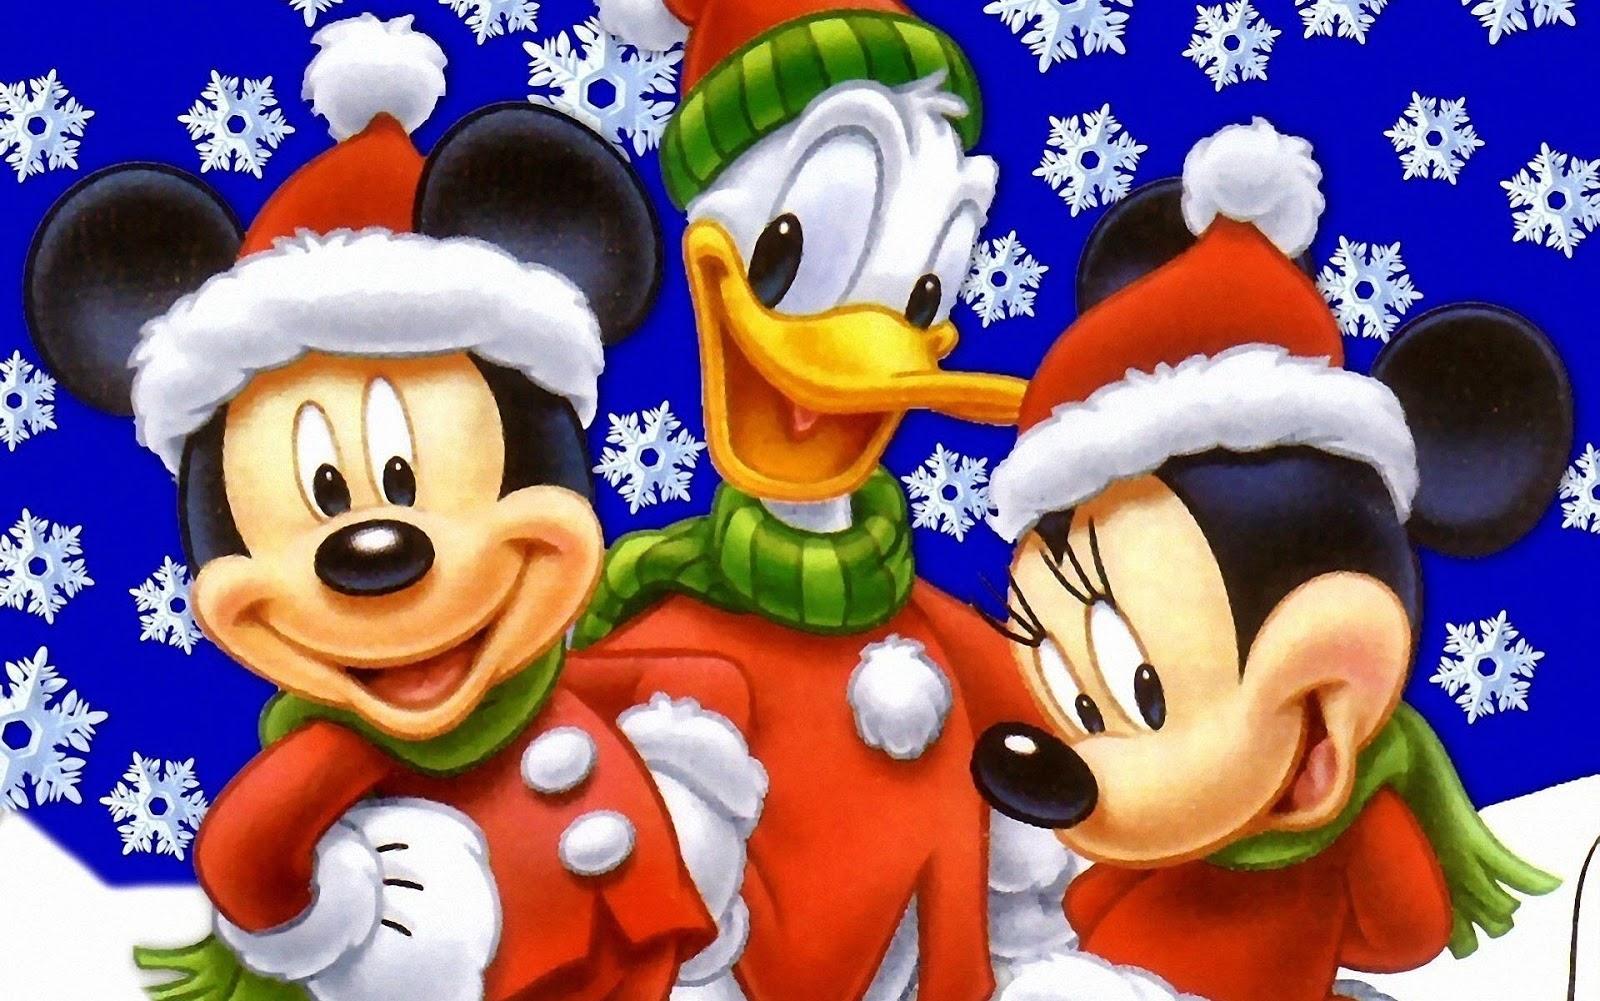 Mickey Mouse Wallpaper Hd Screensaver Cartoon Desktop Wallpaper